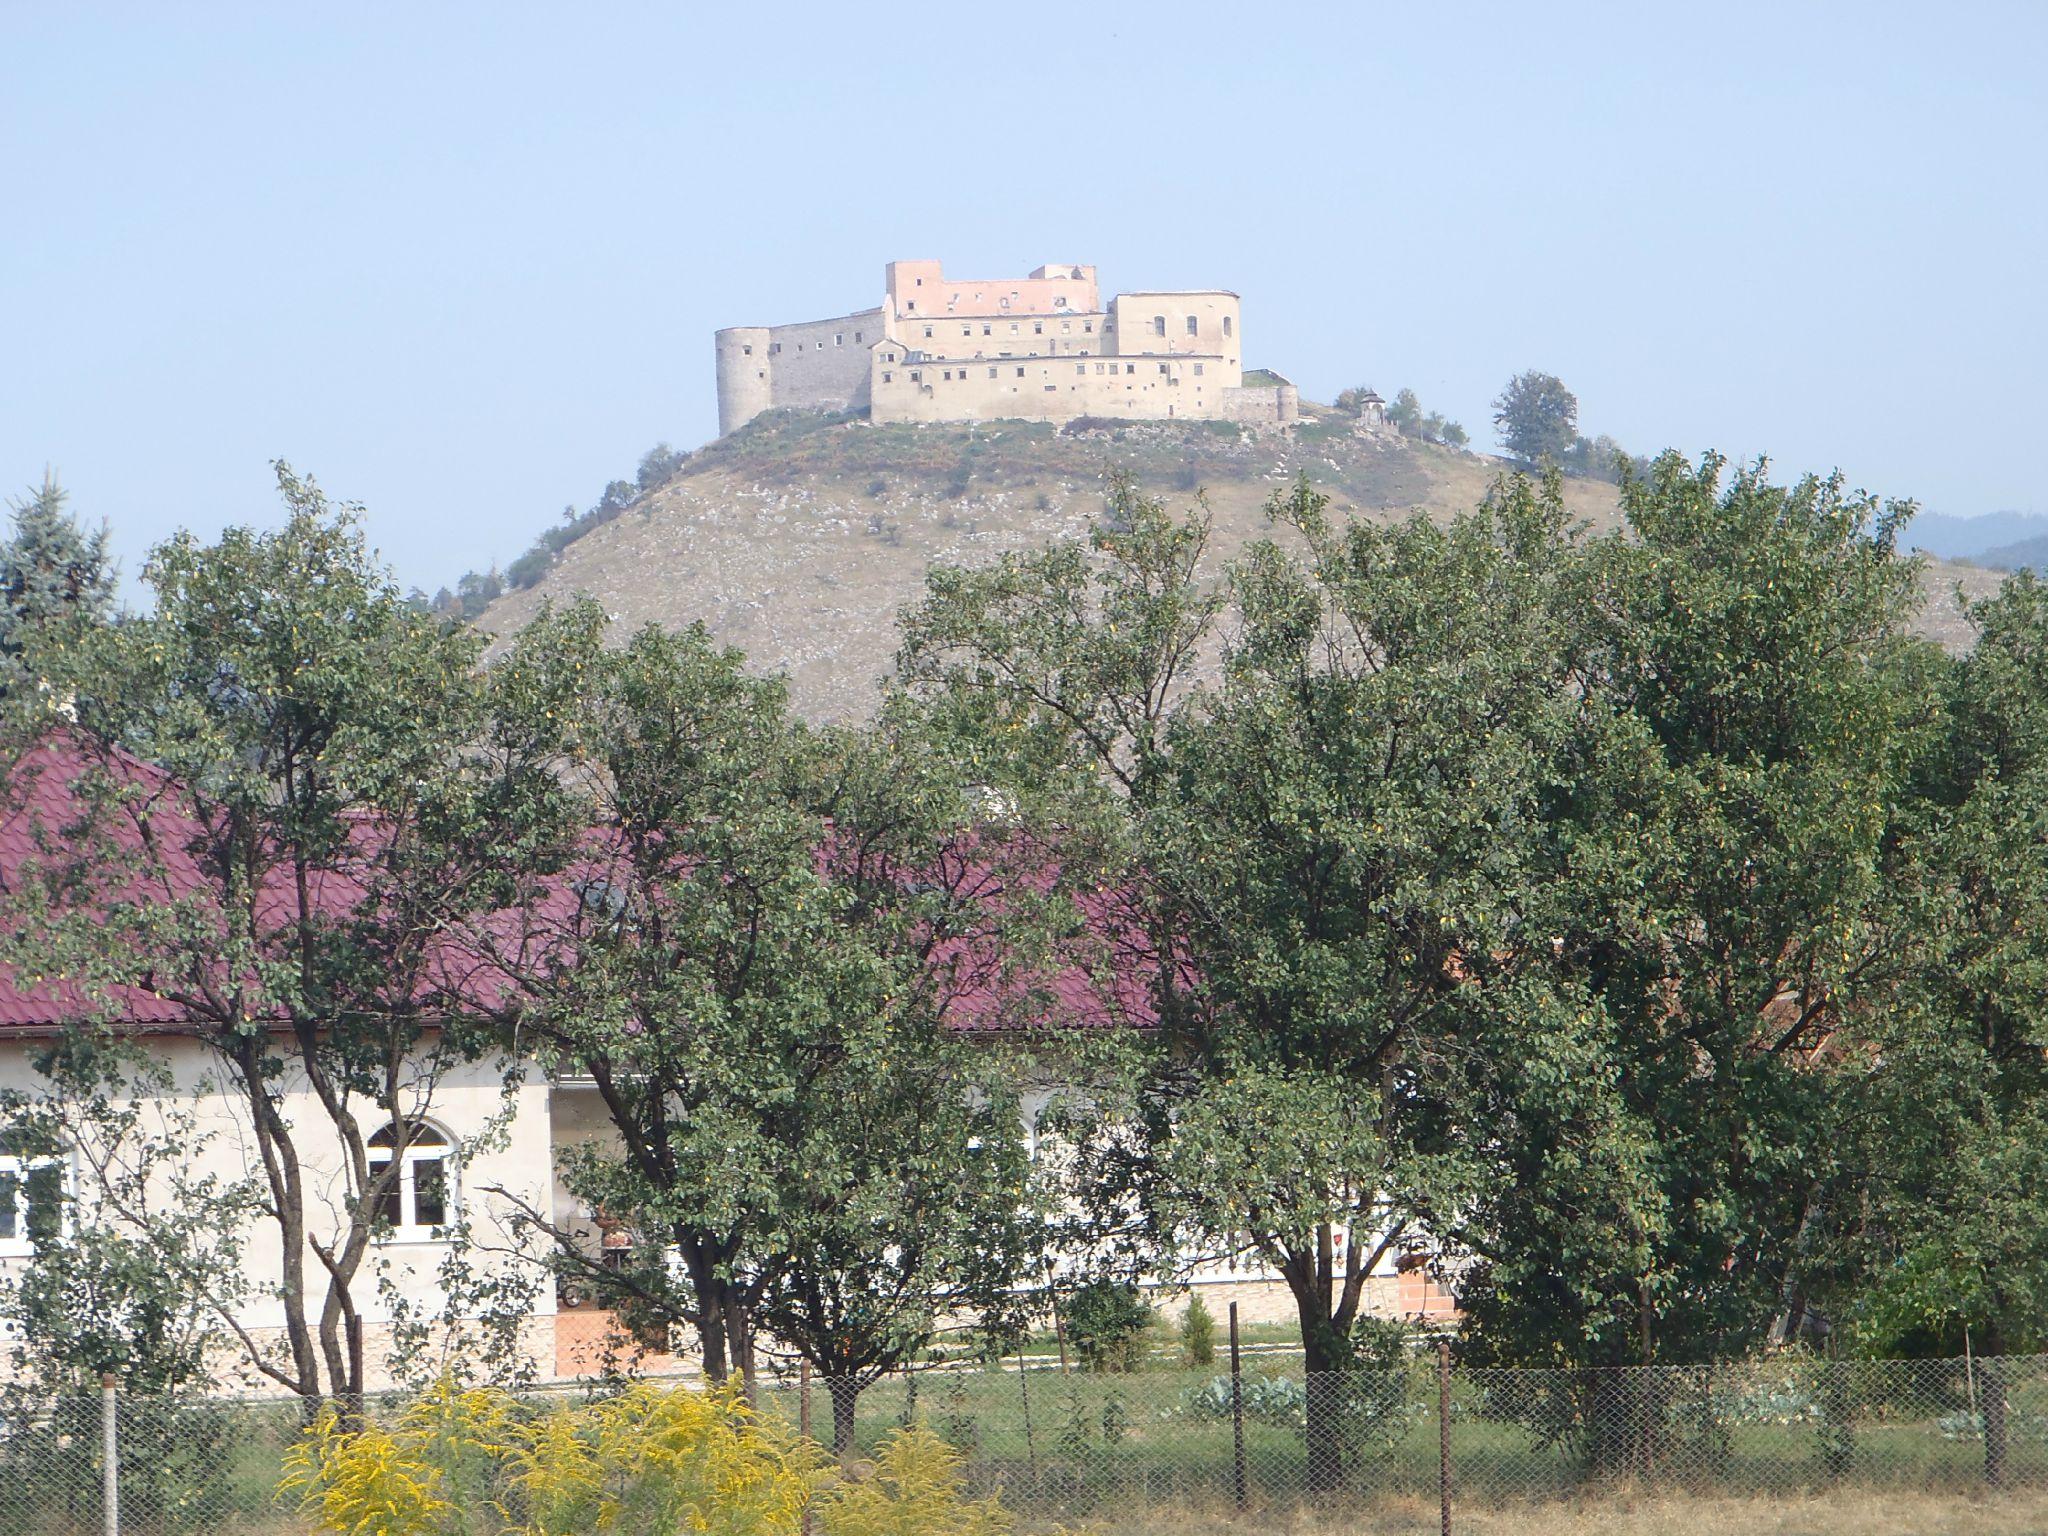 slovaquie - fortifications au hasard de l'iti